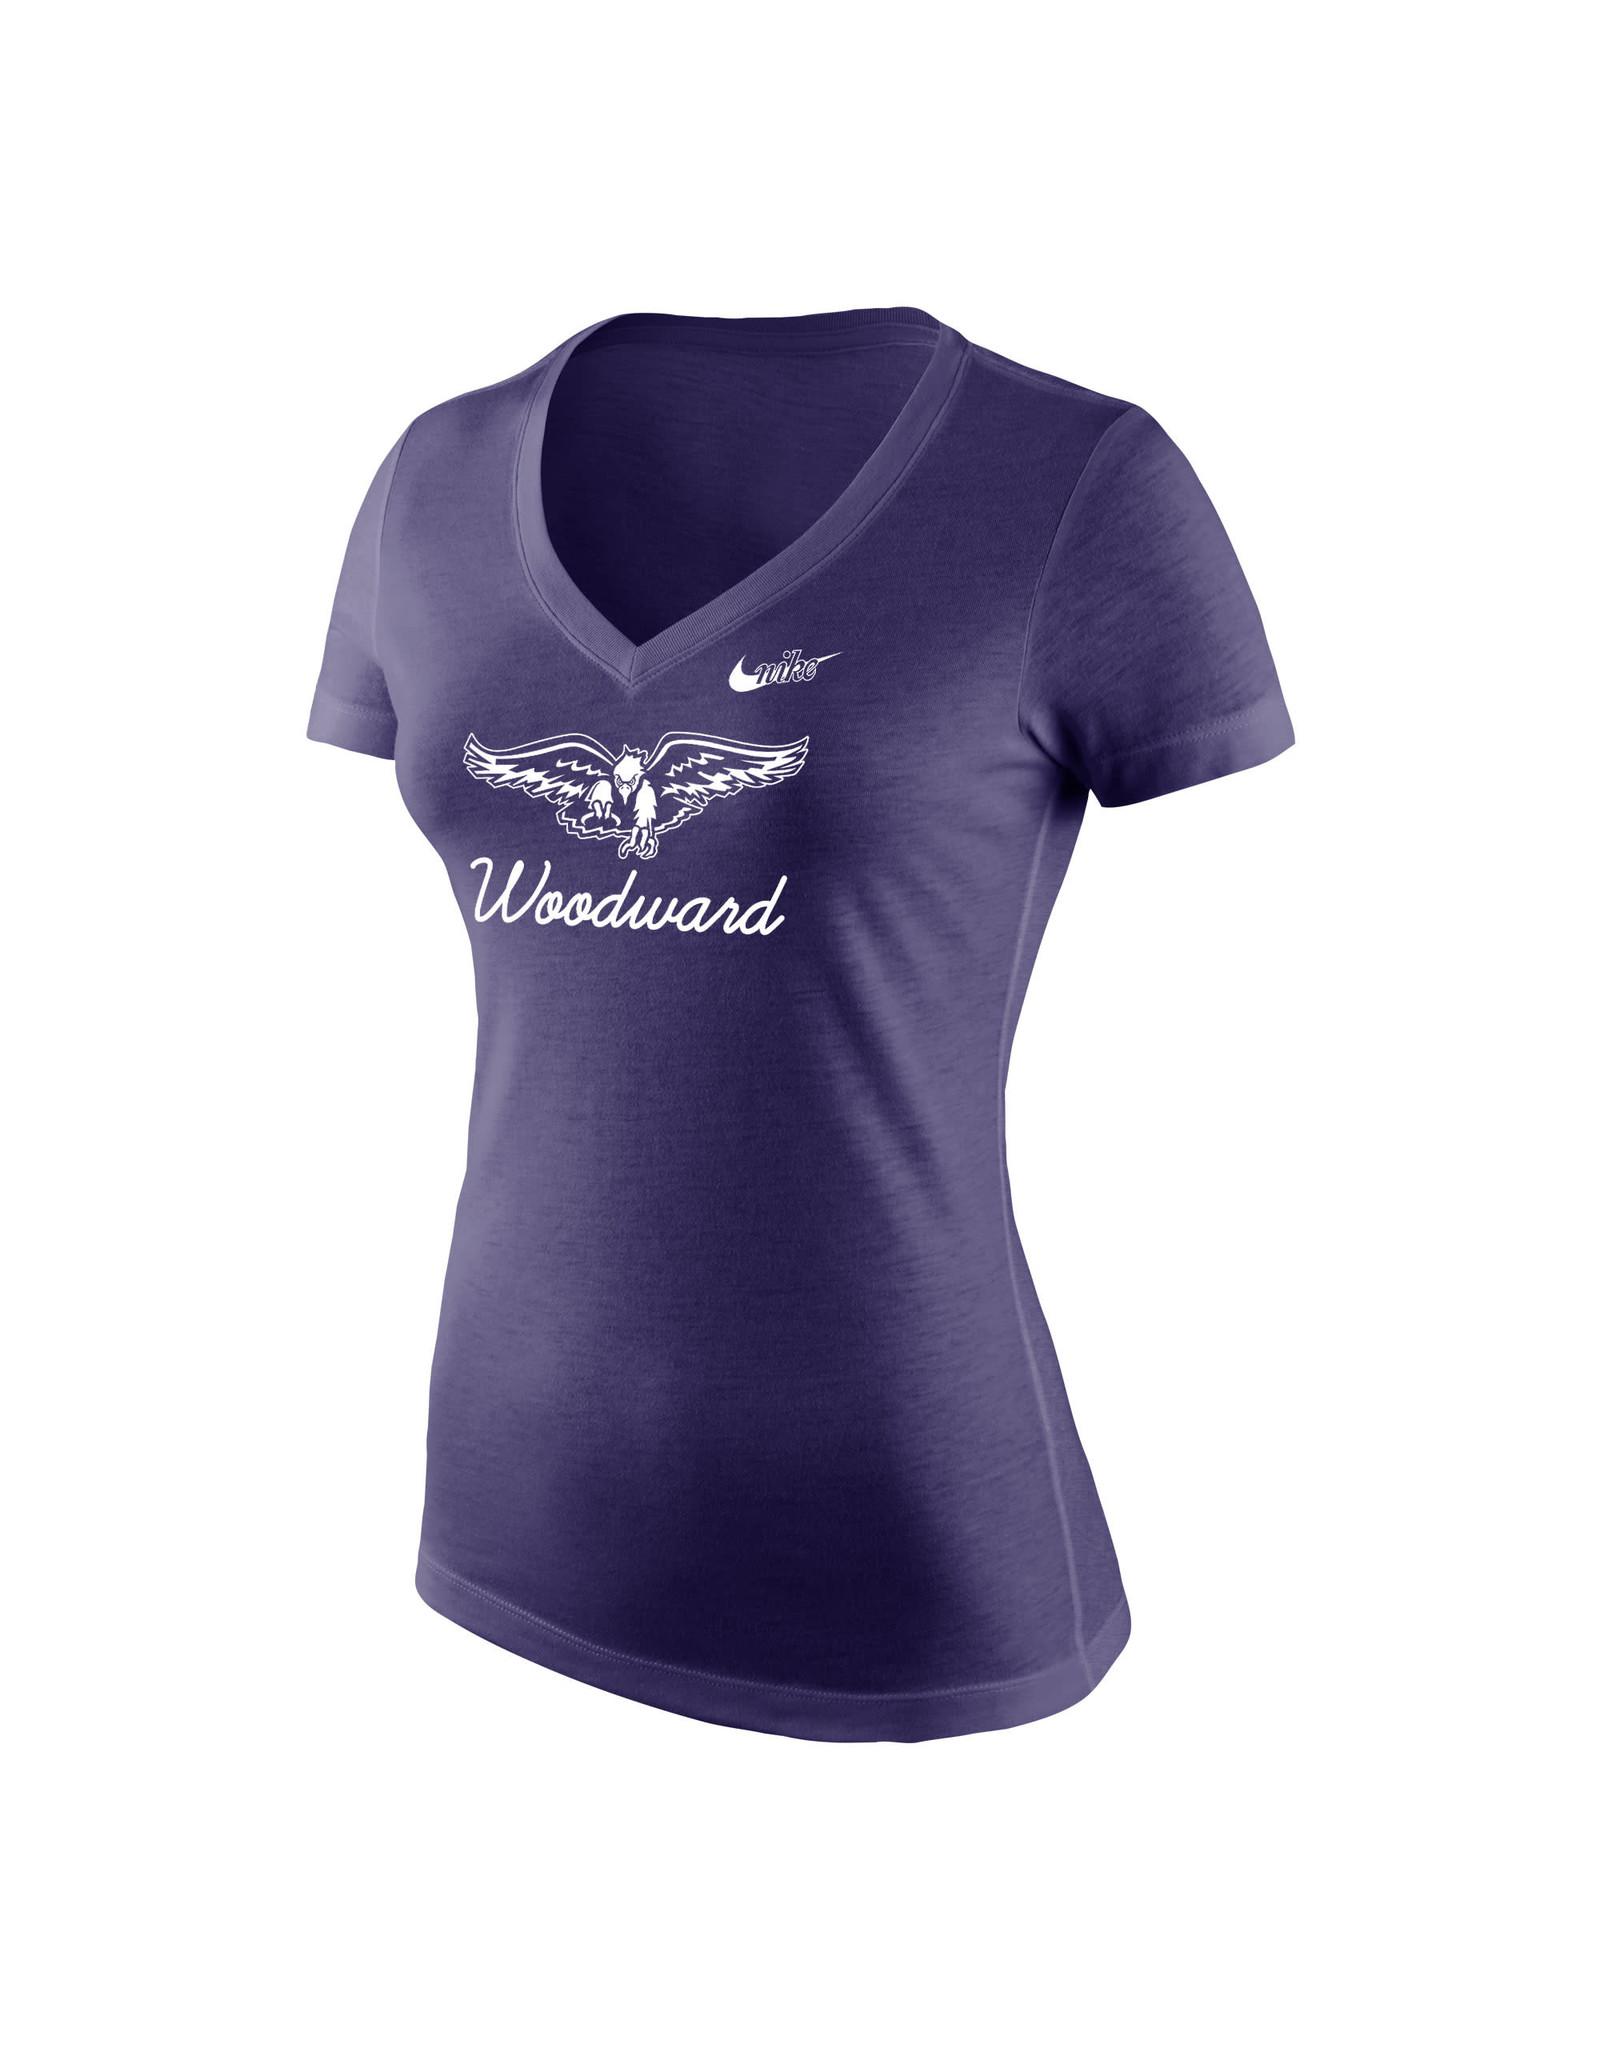 NIKE NIKE Ladies Tri-Blend Mid V Tee in Purple Heather